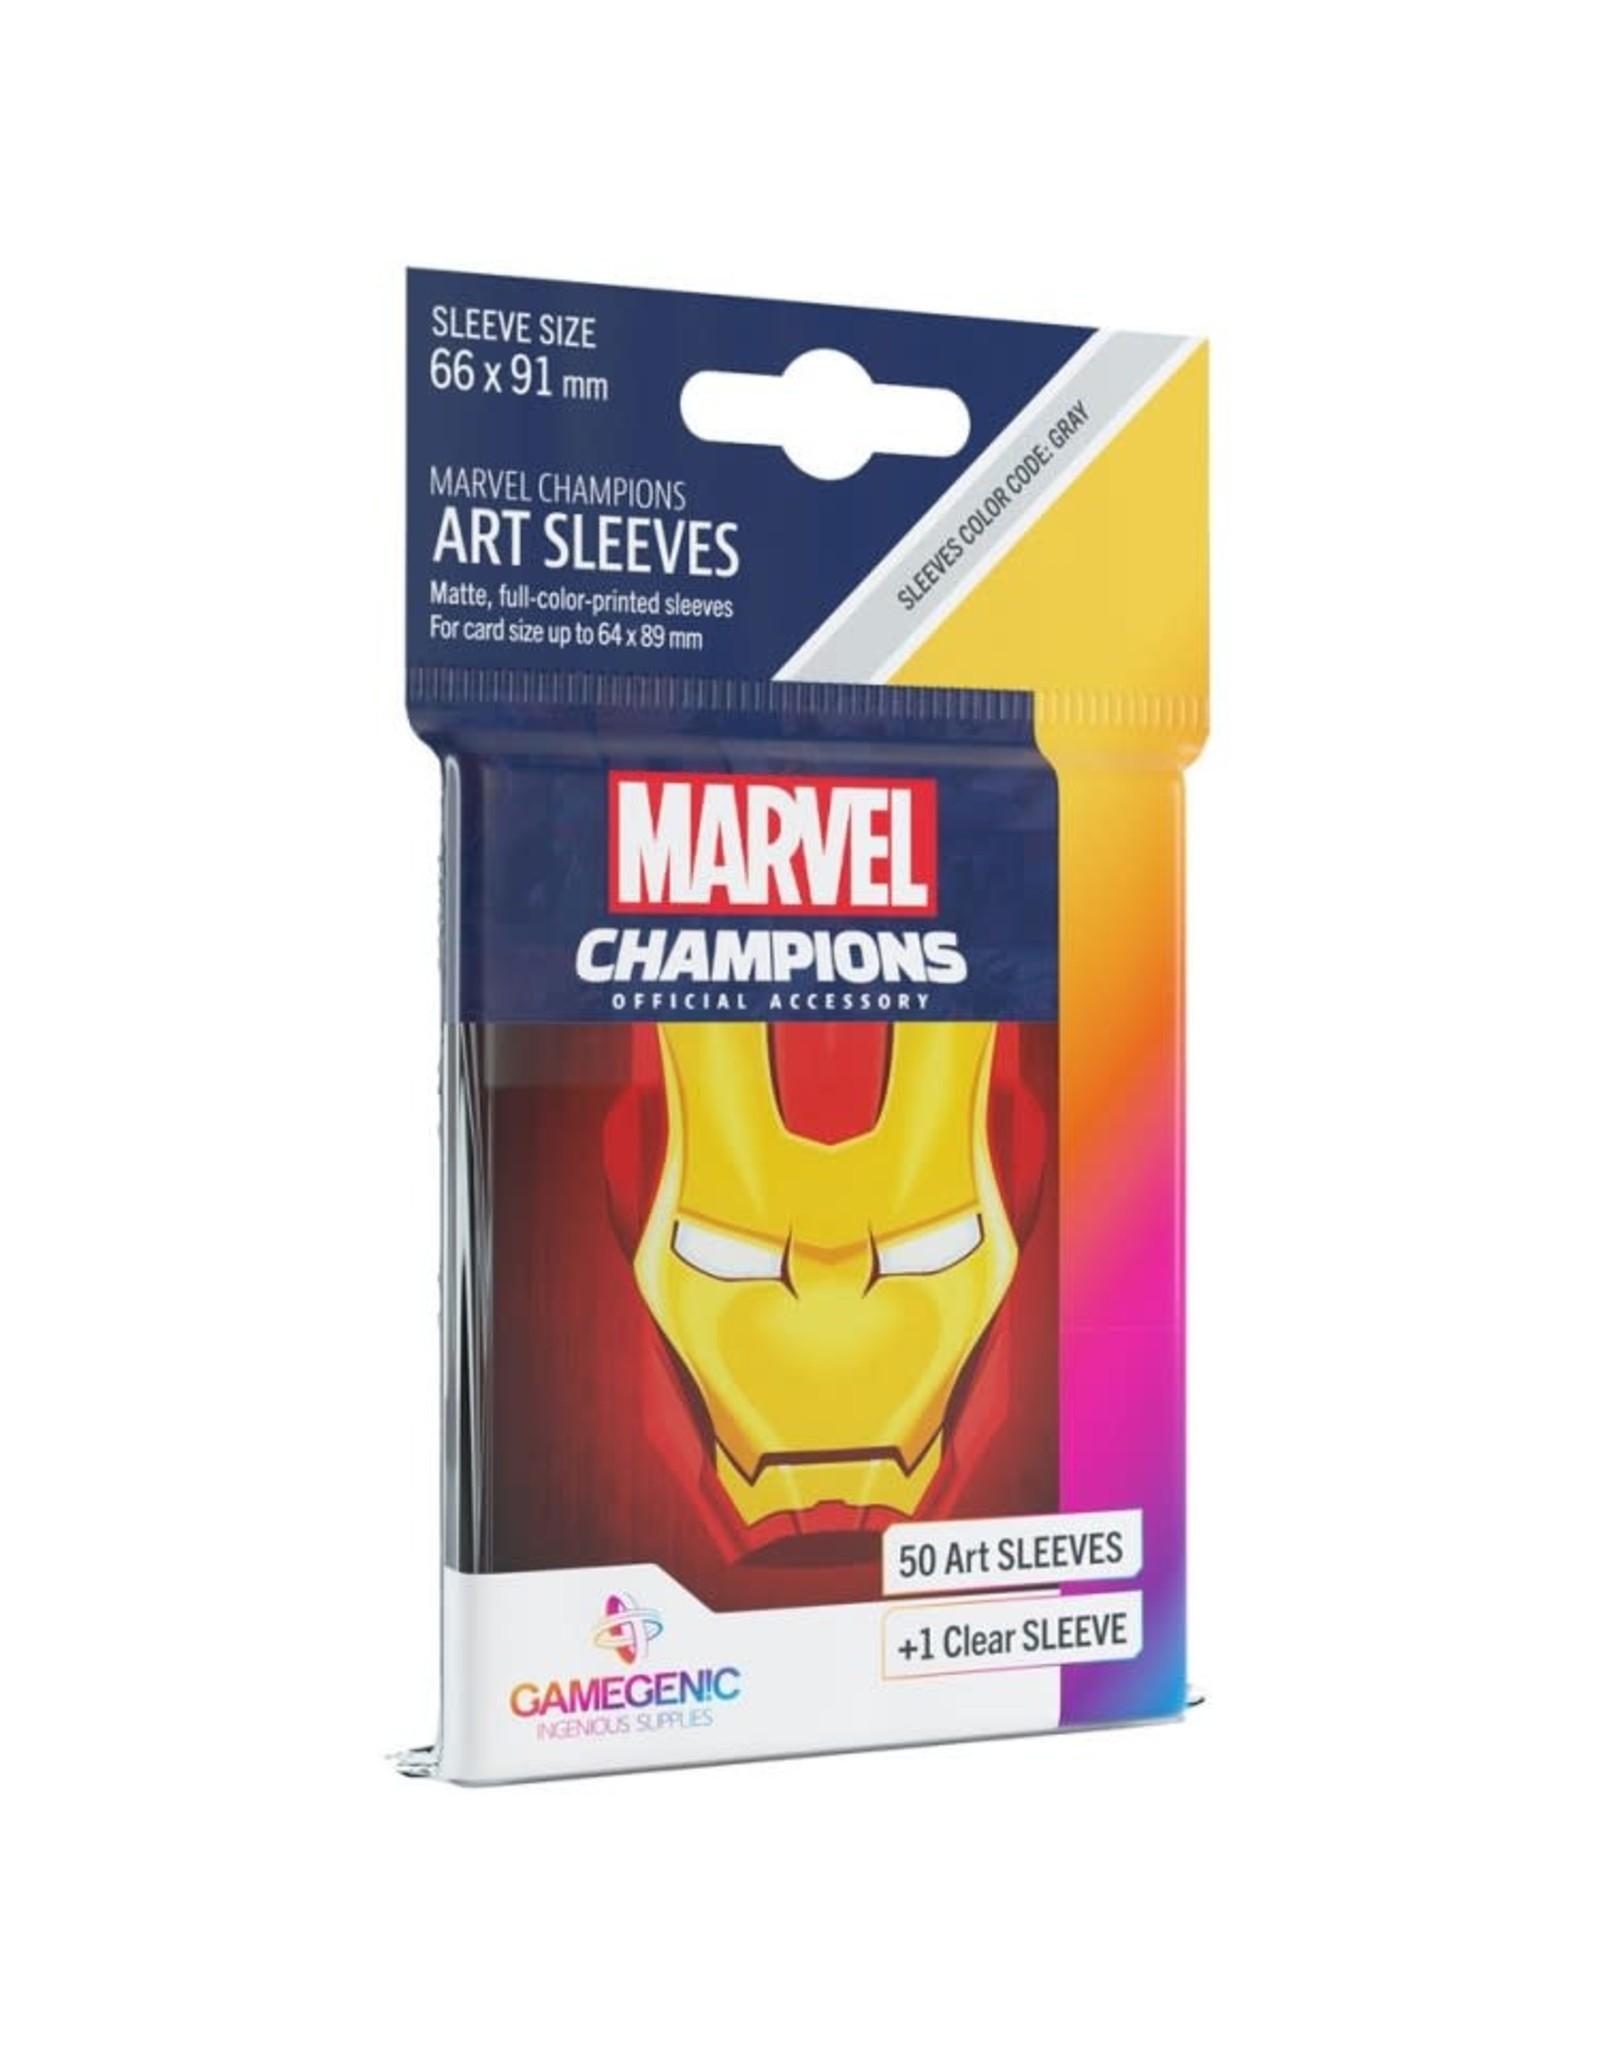 GameGenic Marvel Champions LCG: Iron Man Sleeves